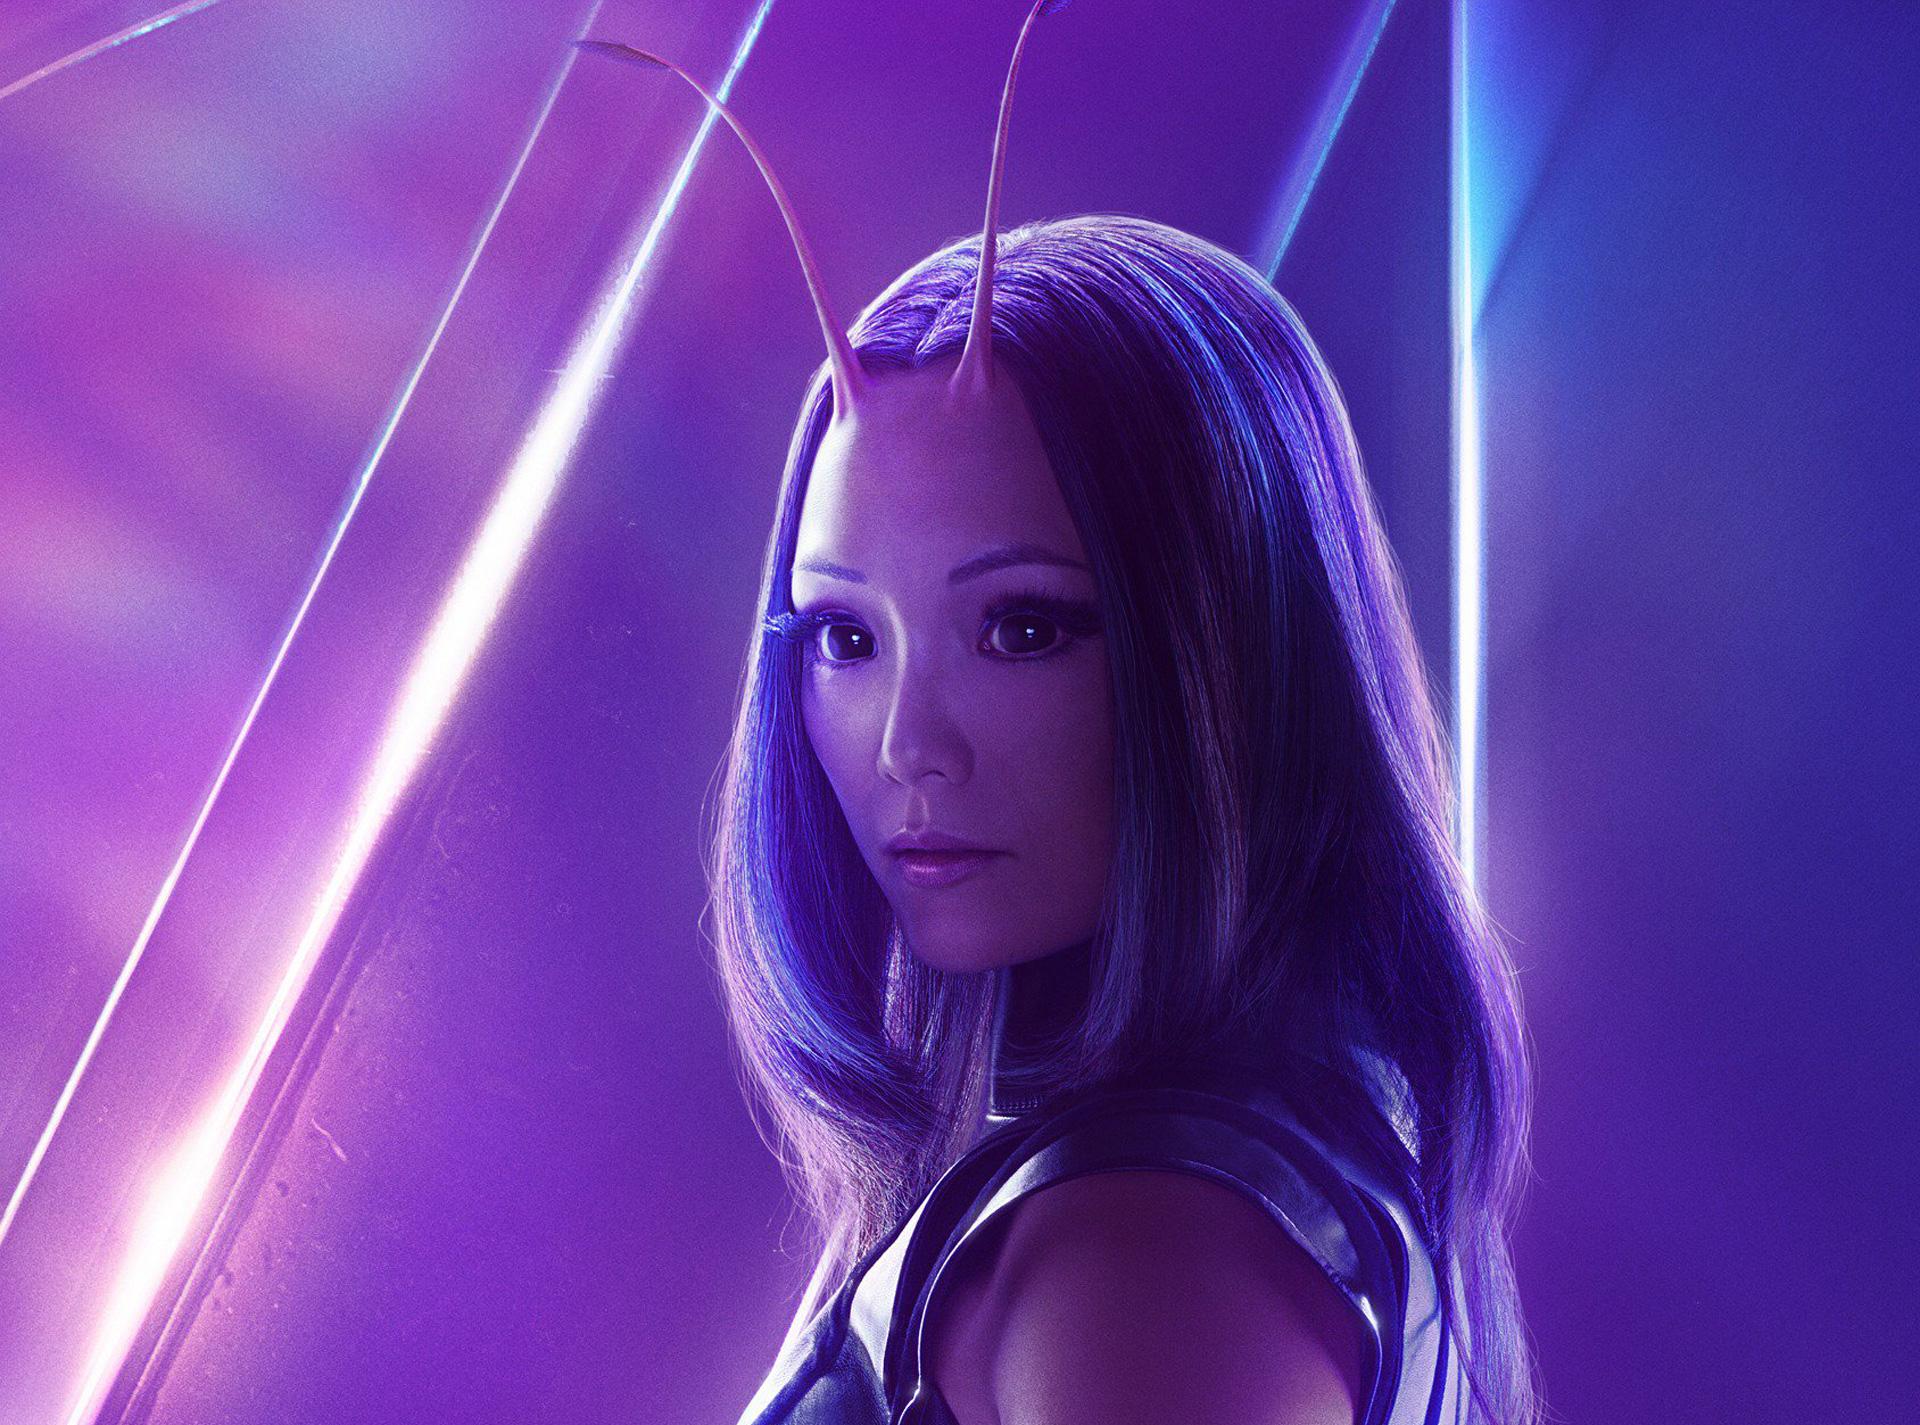 Shuri In Avengers Infinity War New Poster Hd Movies 4k: 1920x1080 Mantis In Avengers Infinity War New Poster